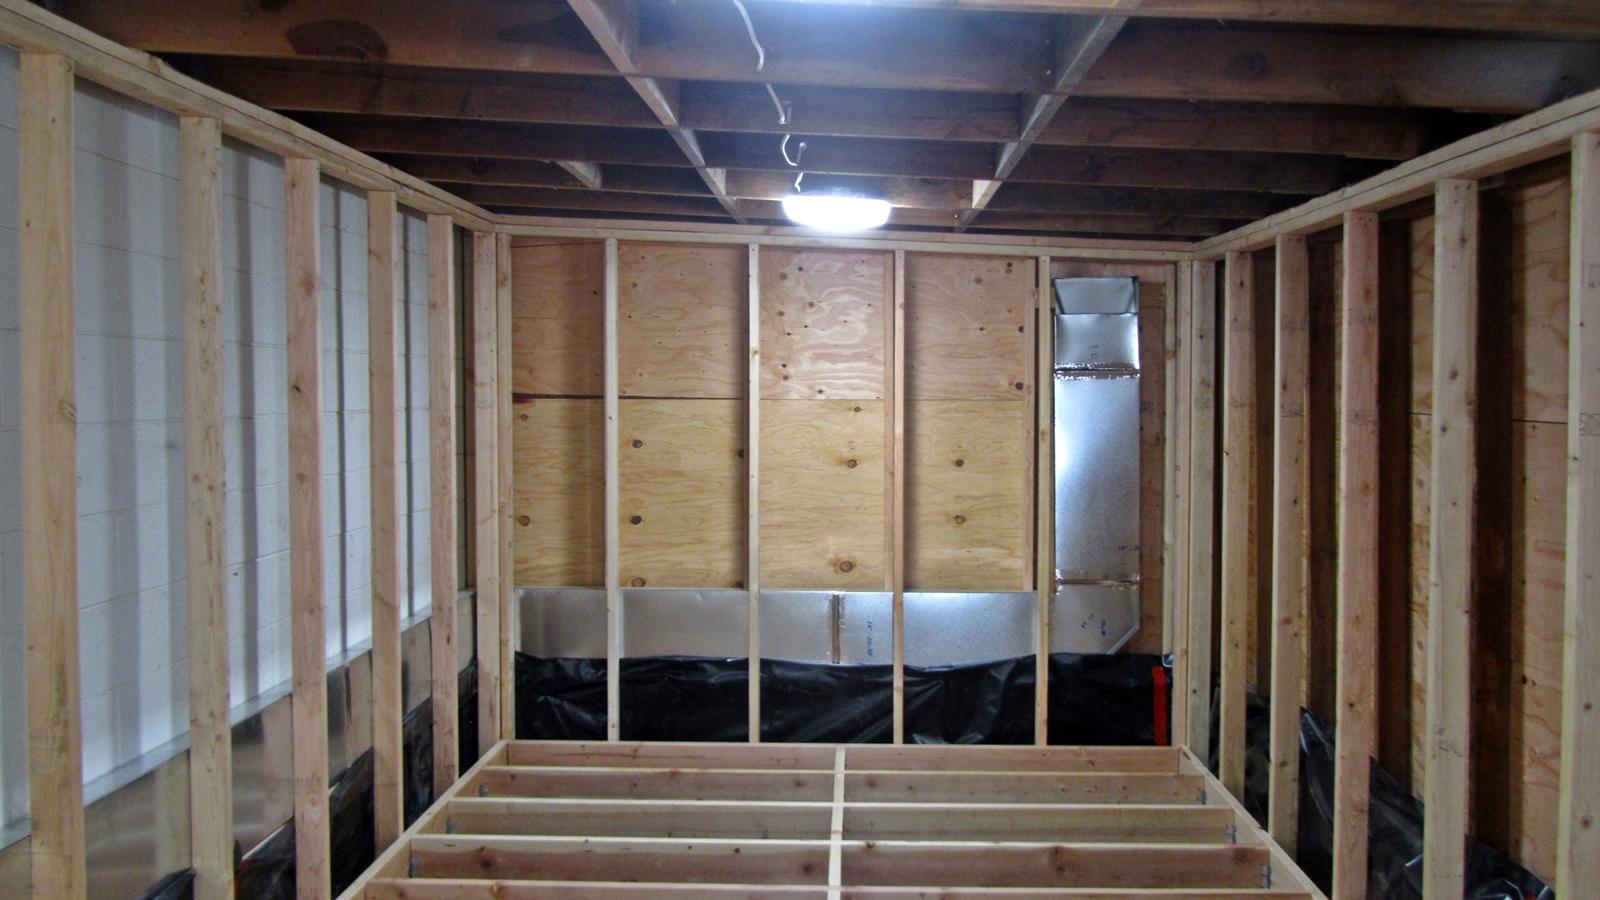 2. Reframing walls and adding aircon ducts